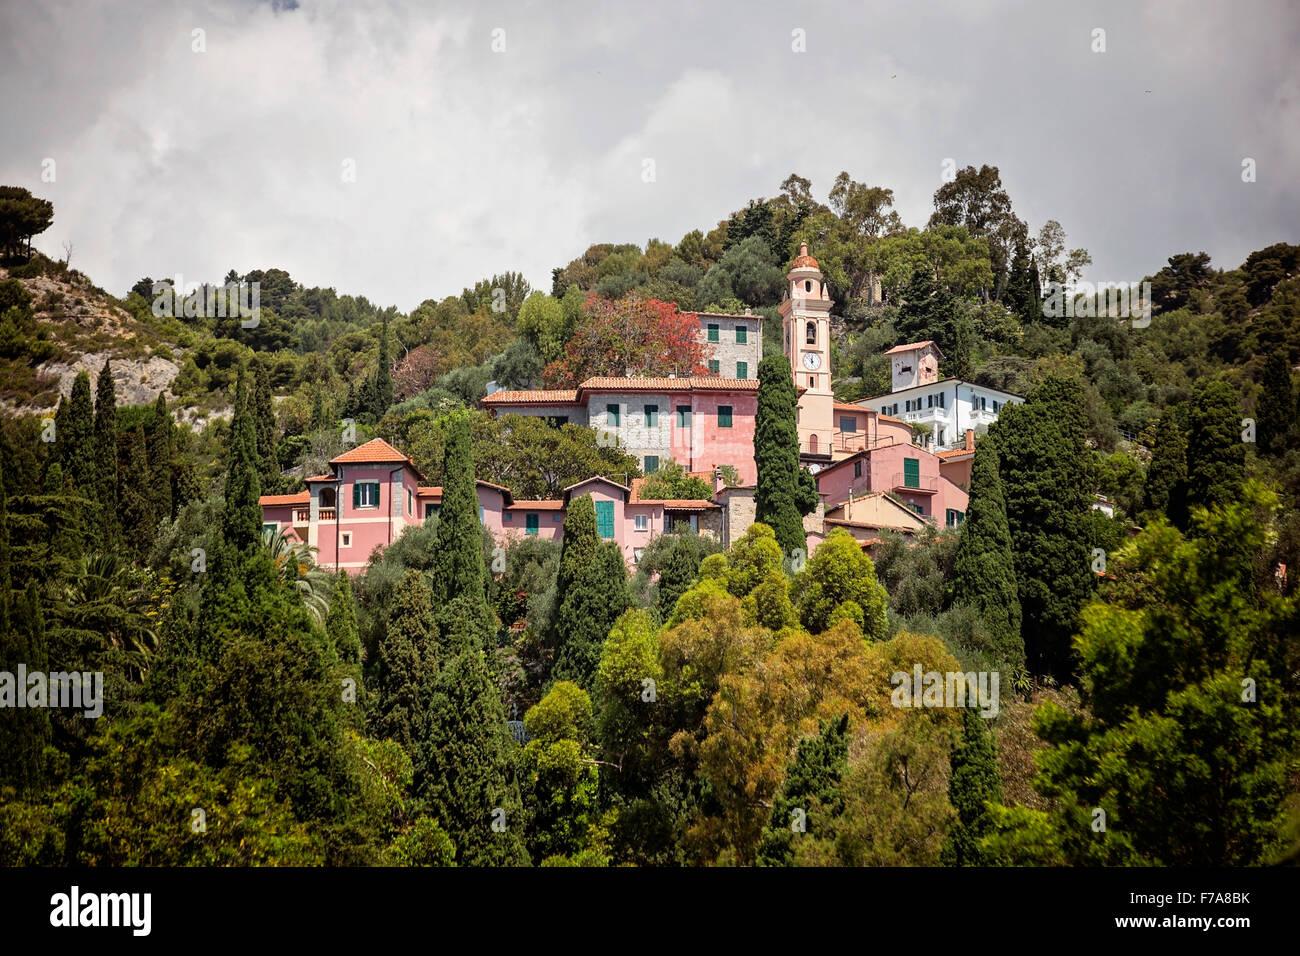 Mortola Inferiore, Hanbury Botanical Gardens, Ventimiglia, Imperia, Liguria, Italy. - Stock Image